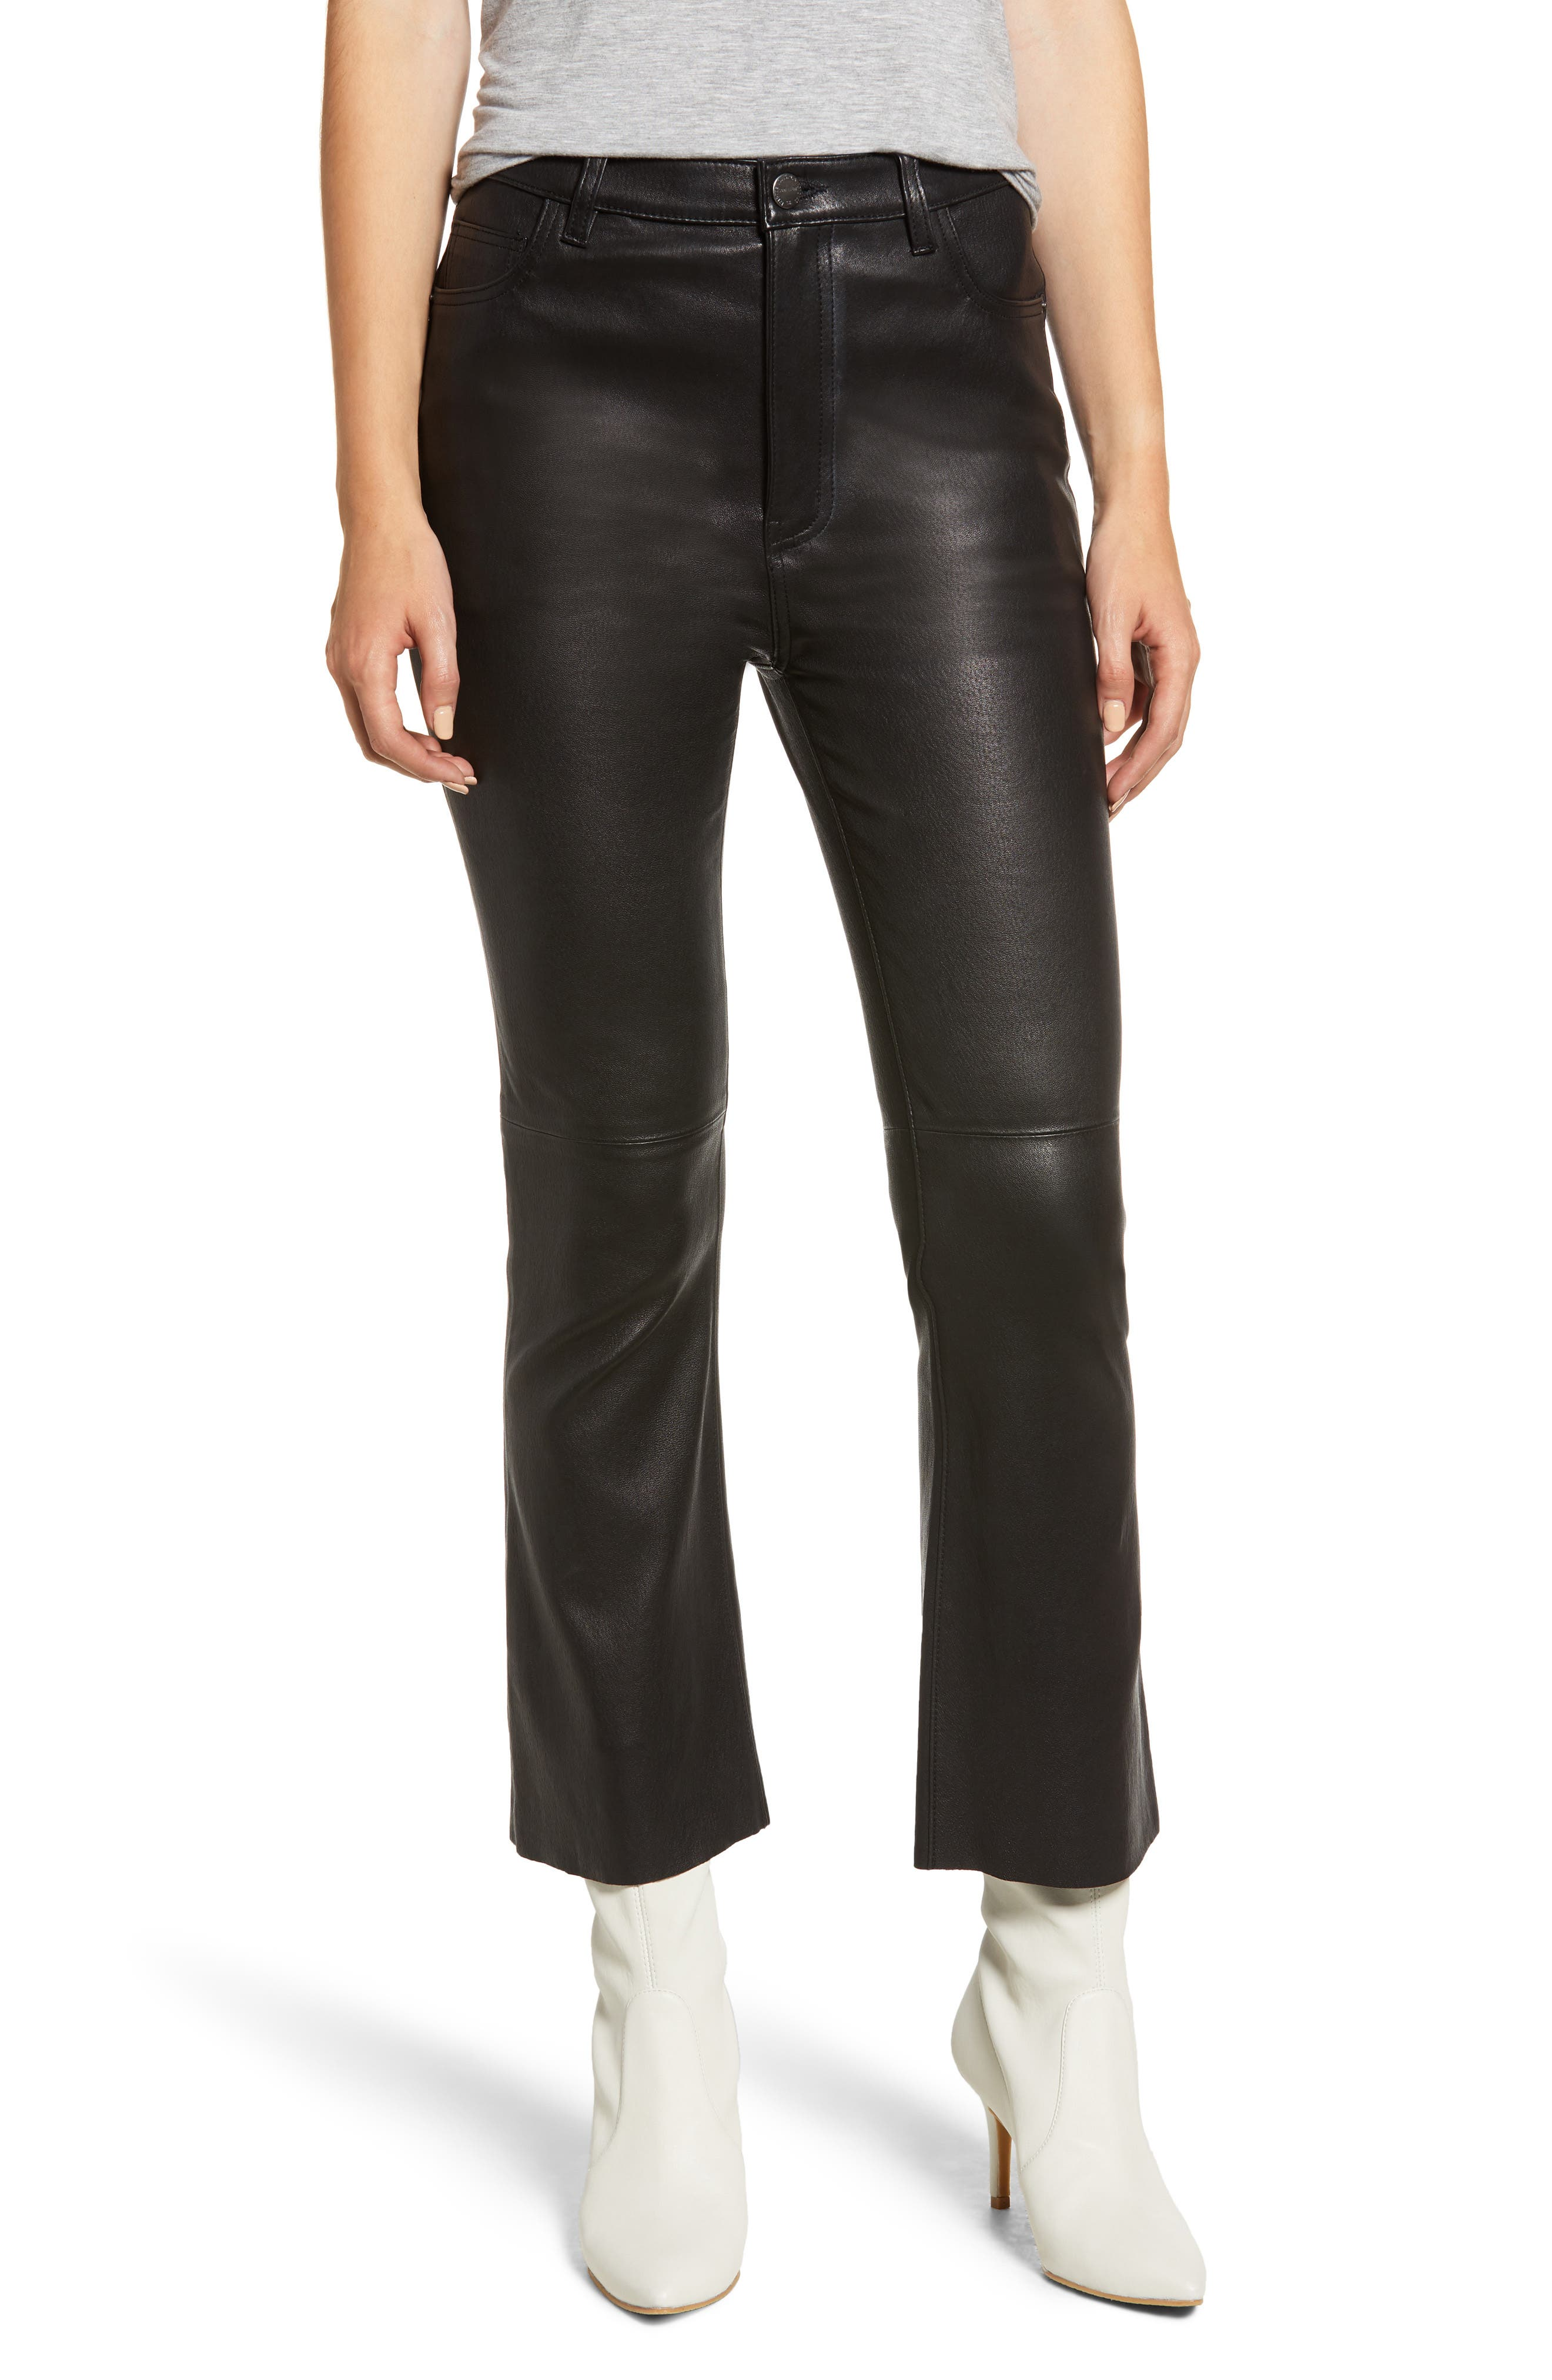 CURRENT ELLIOTT Current/Elliott High-Rise Kick Flare Leather Pants in Black W/ Raw Hem